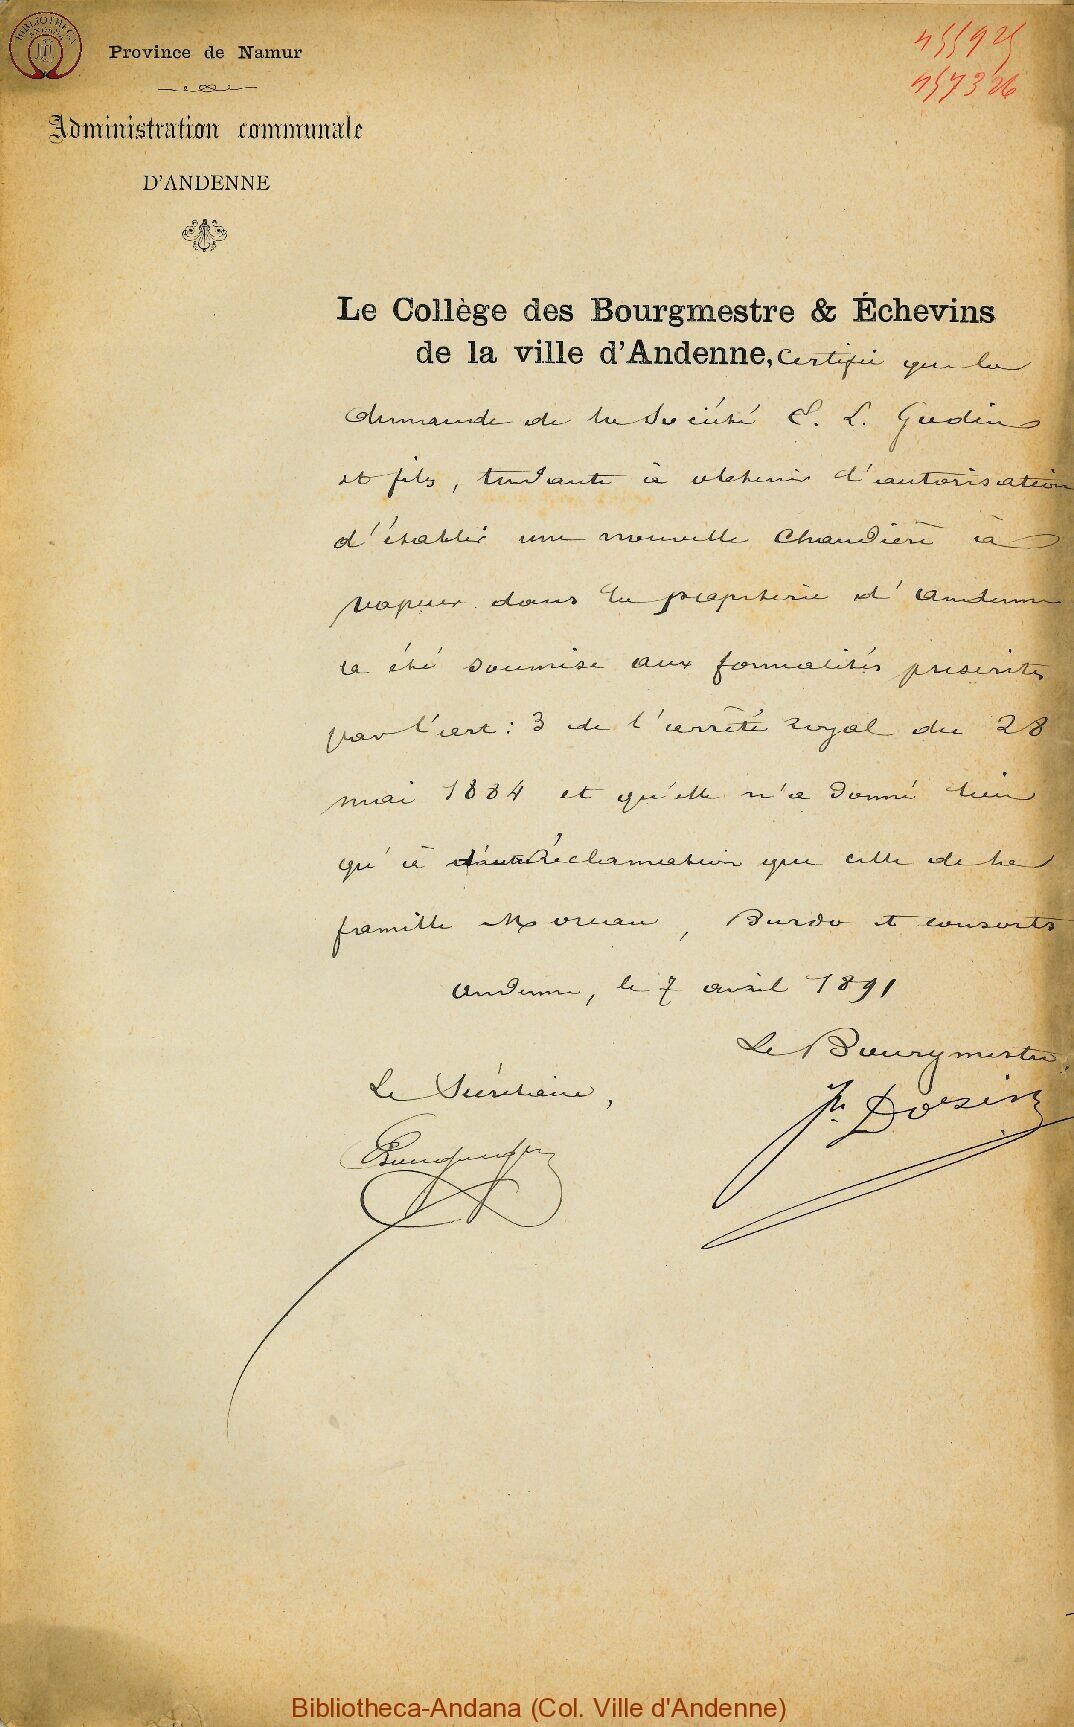 1891-04-07